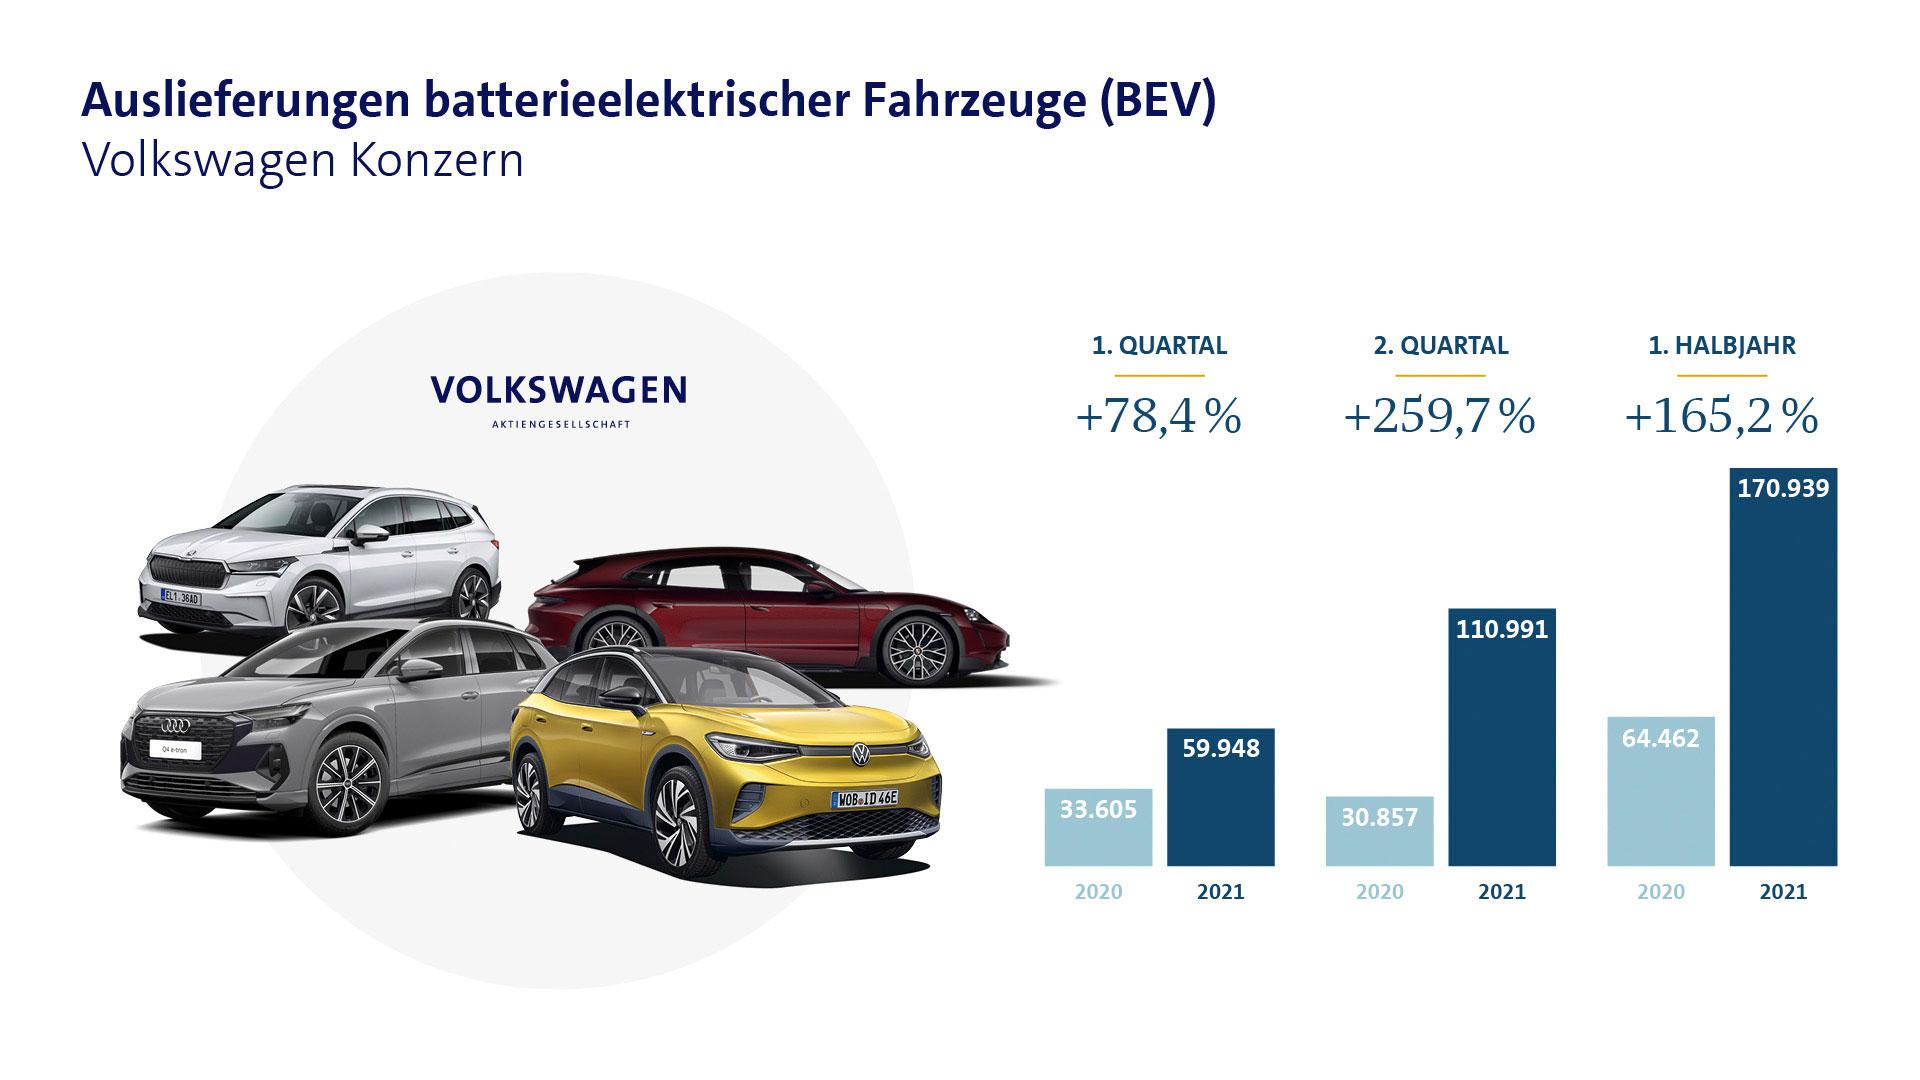 VW-Elektroauto-Absatz-1.-Halbjahr-2021